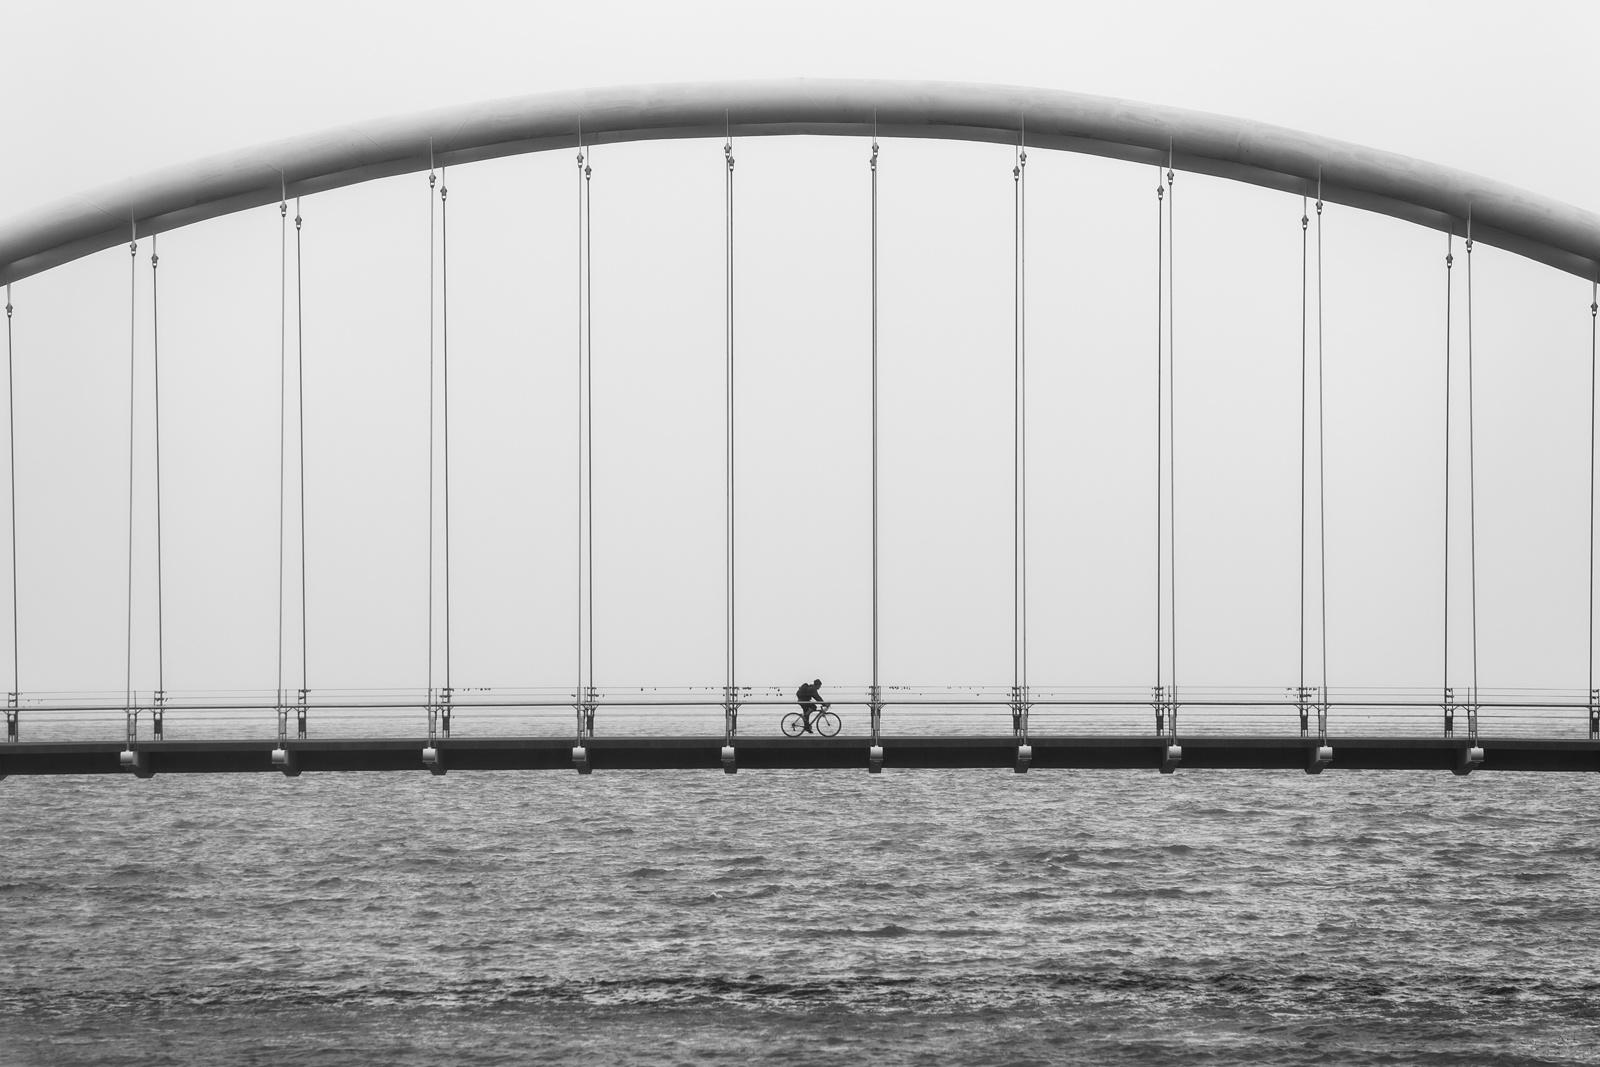 2017-06-29-bridge-knowledge.jpg